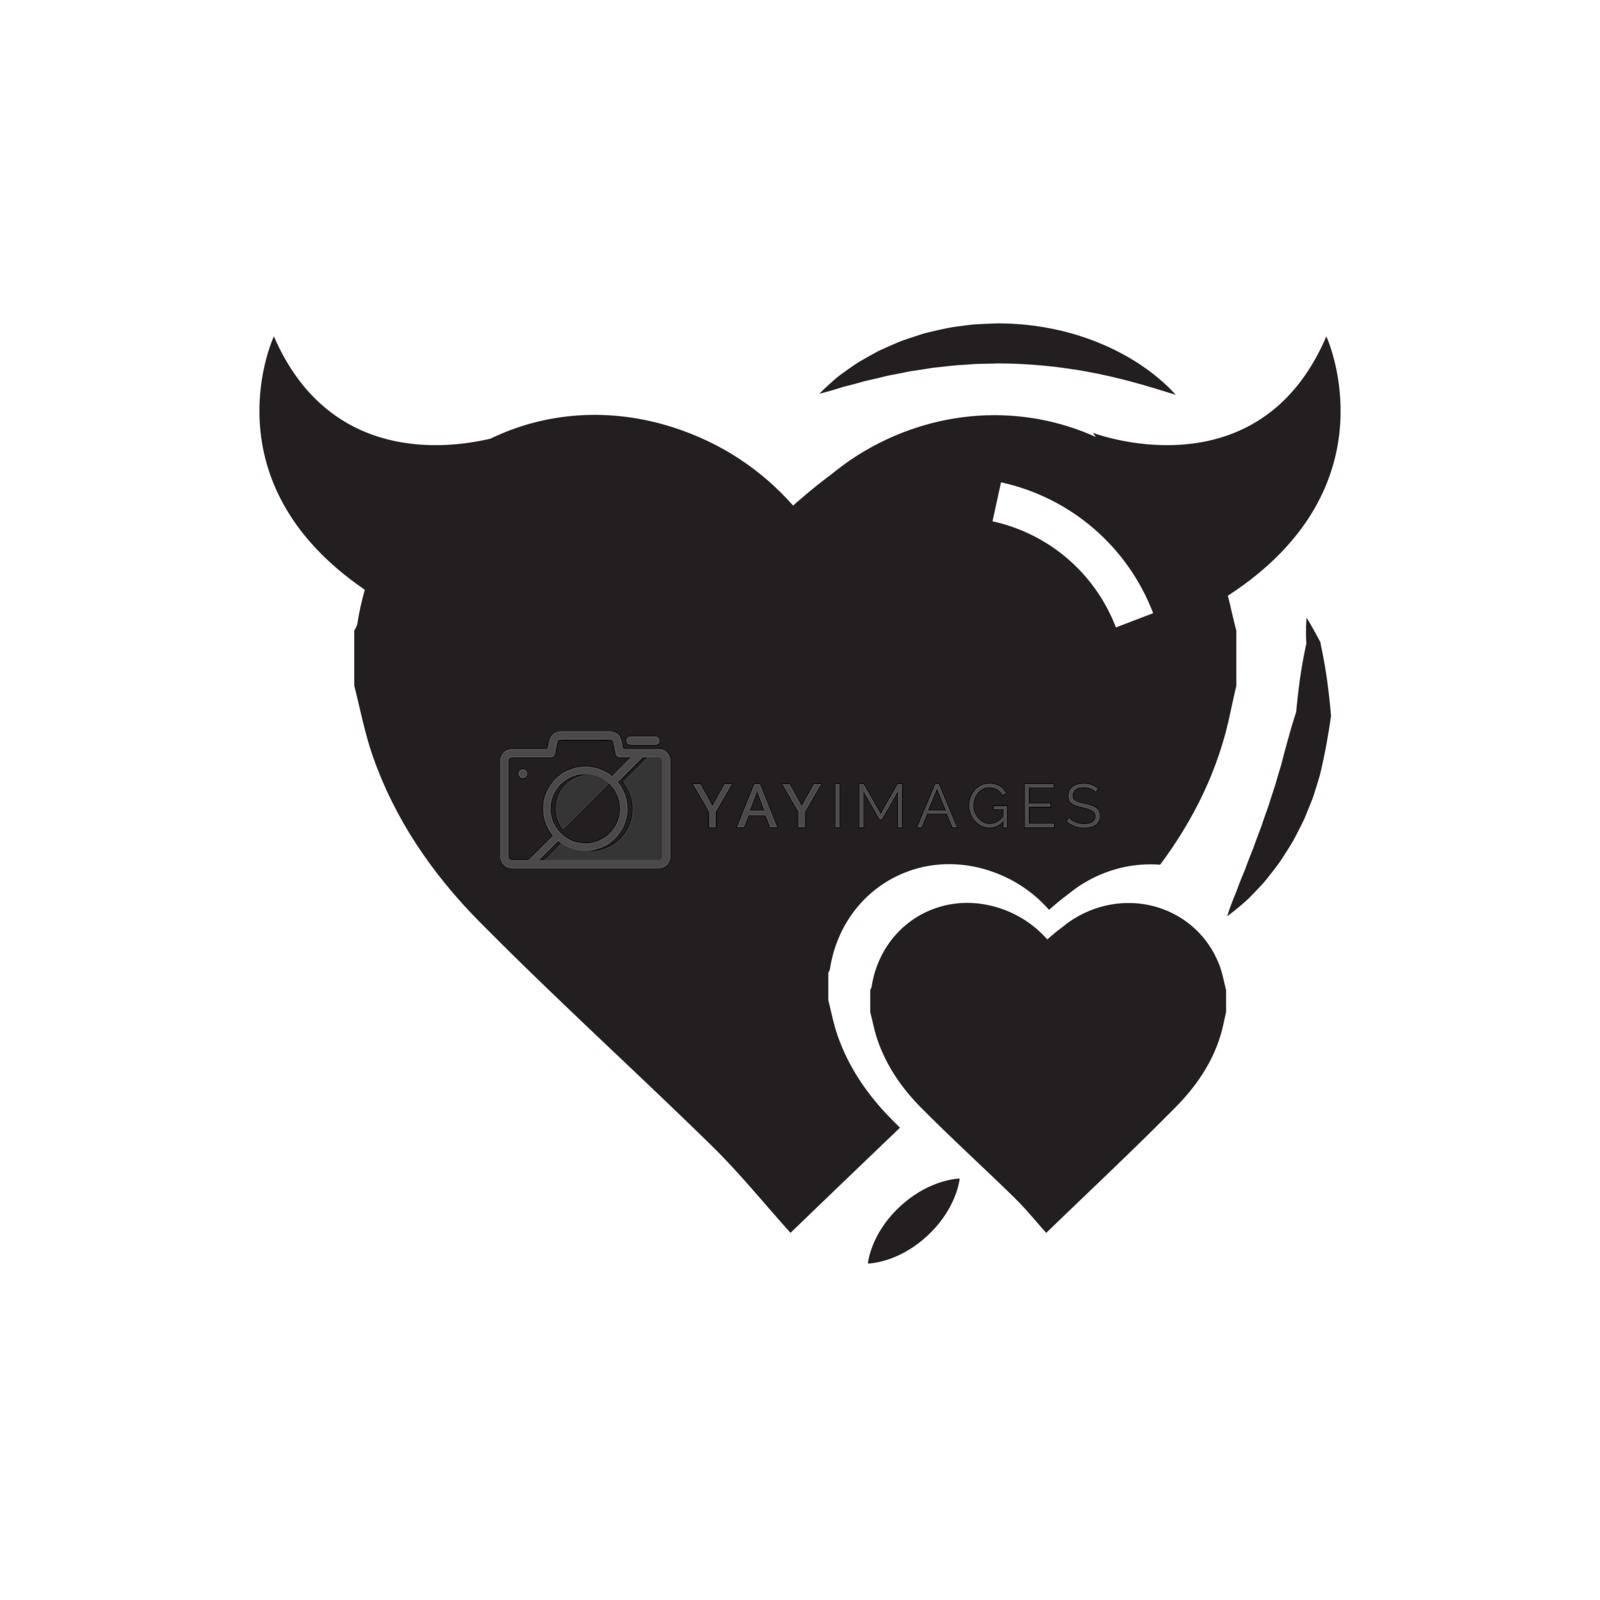 Heart Mini of Devil love black color